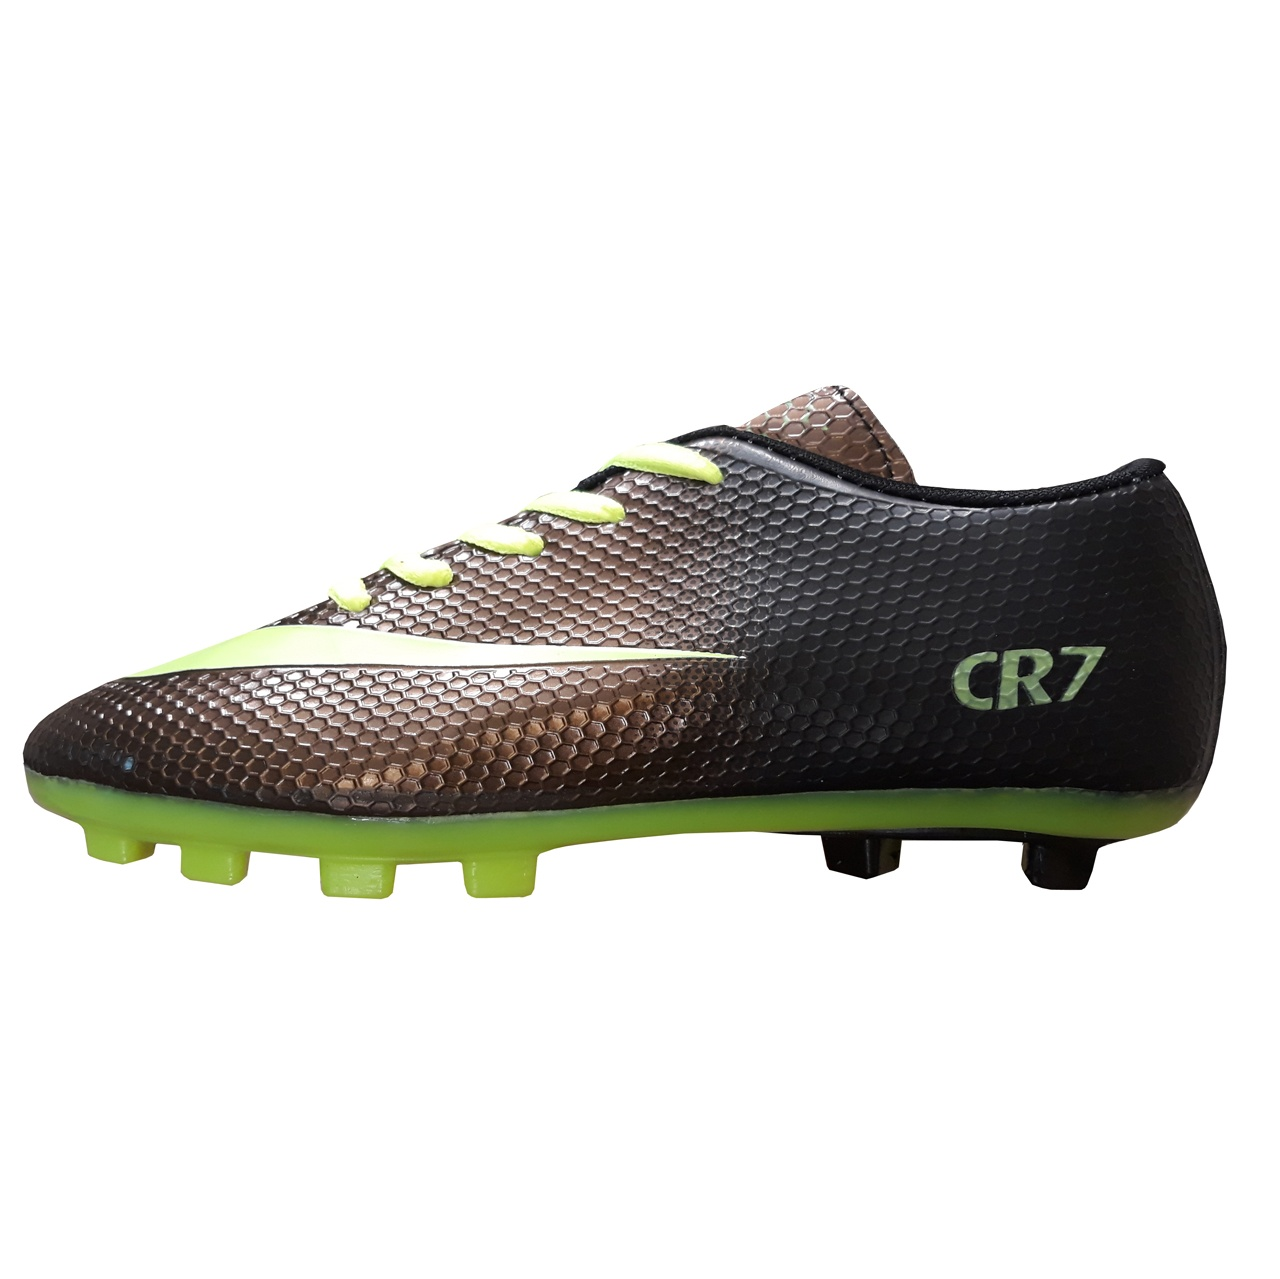 کفش فوتبال استوک دار پسرانه کد 010CR7                     غیر اصل